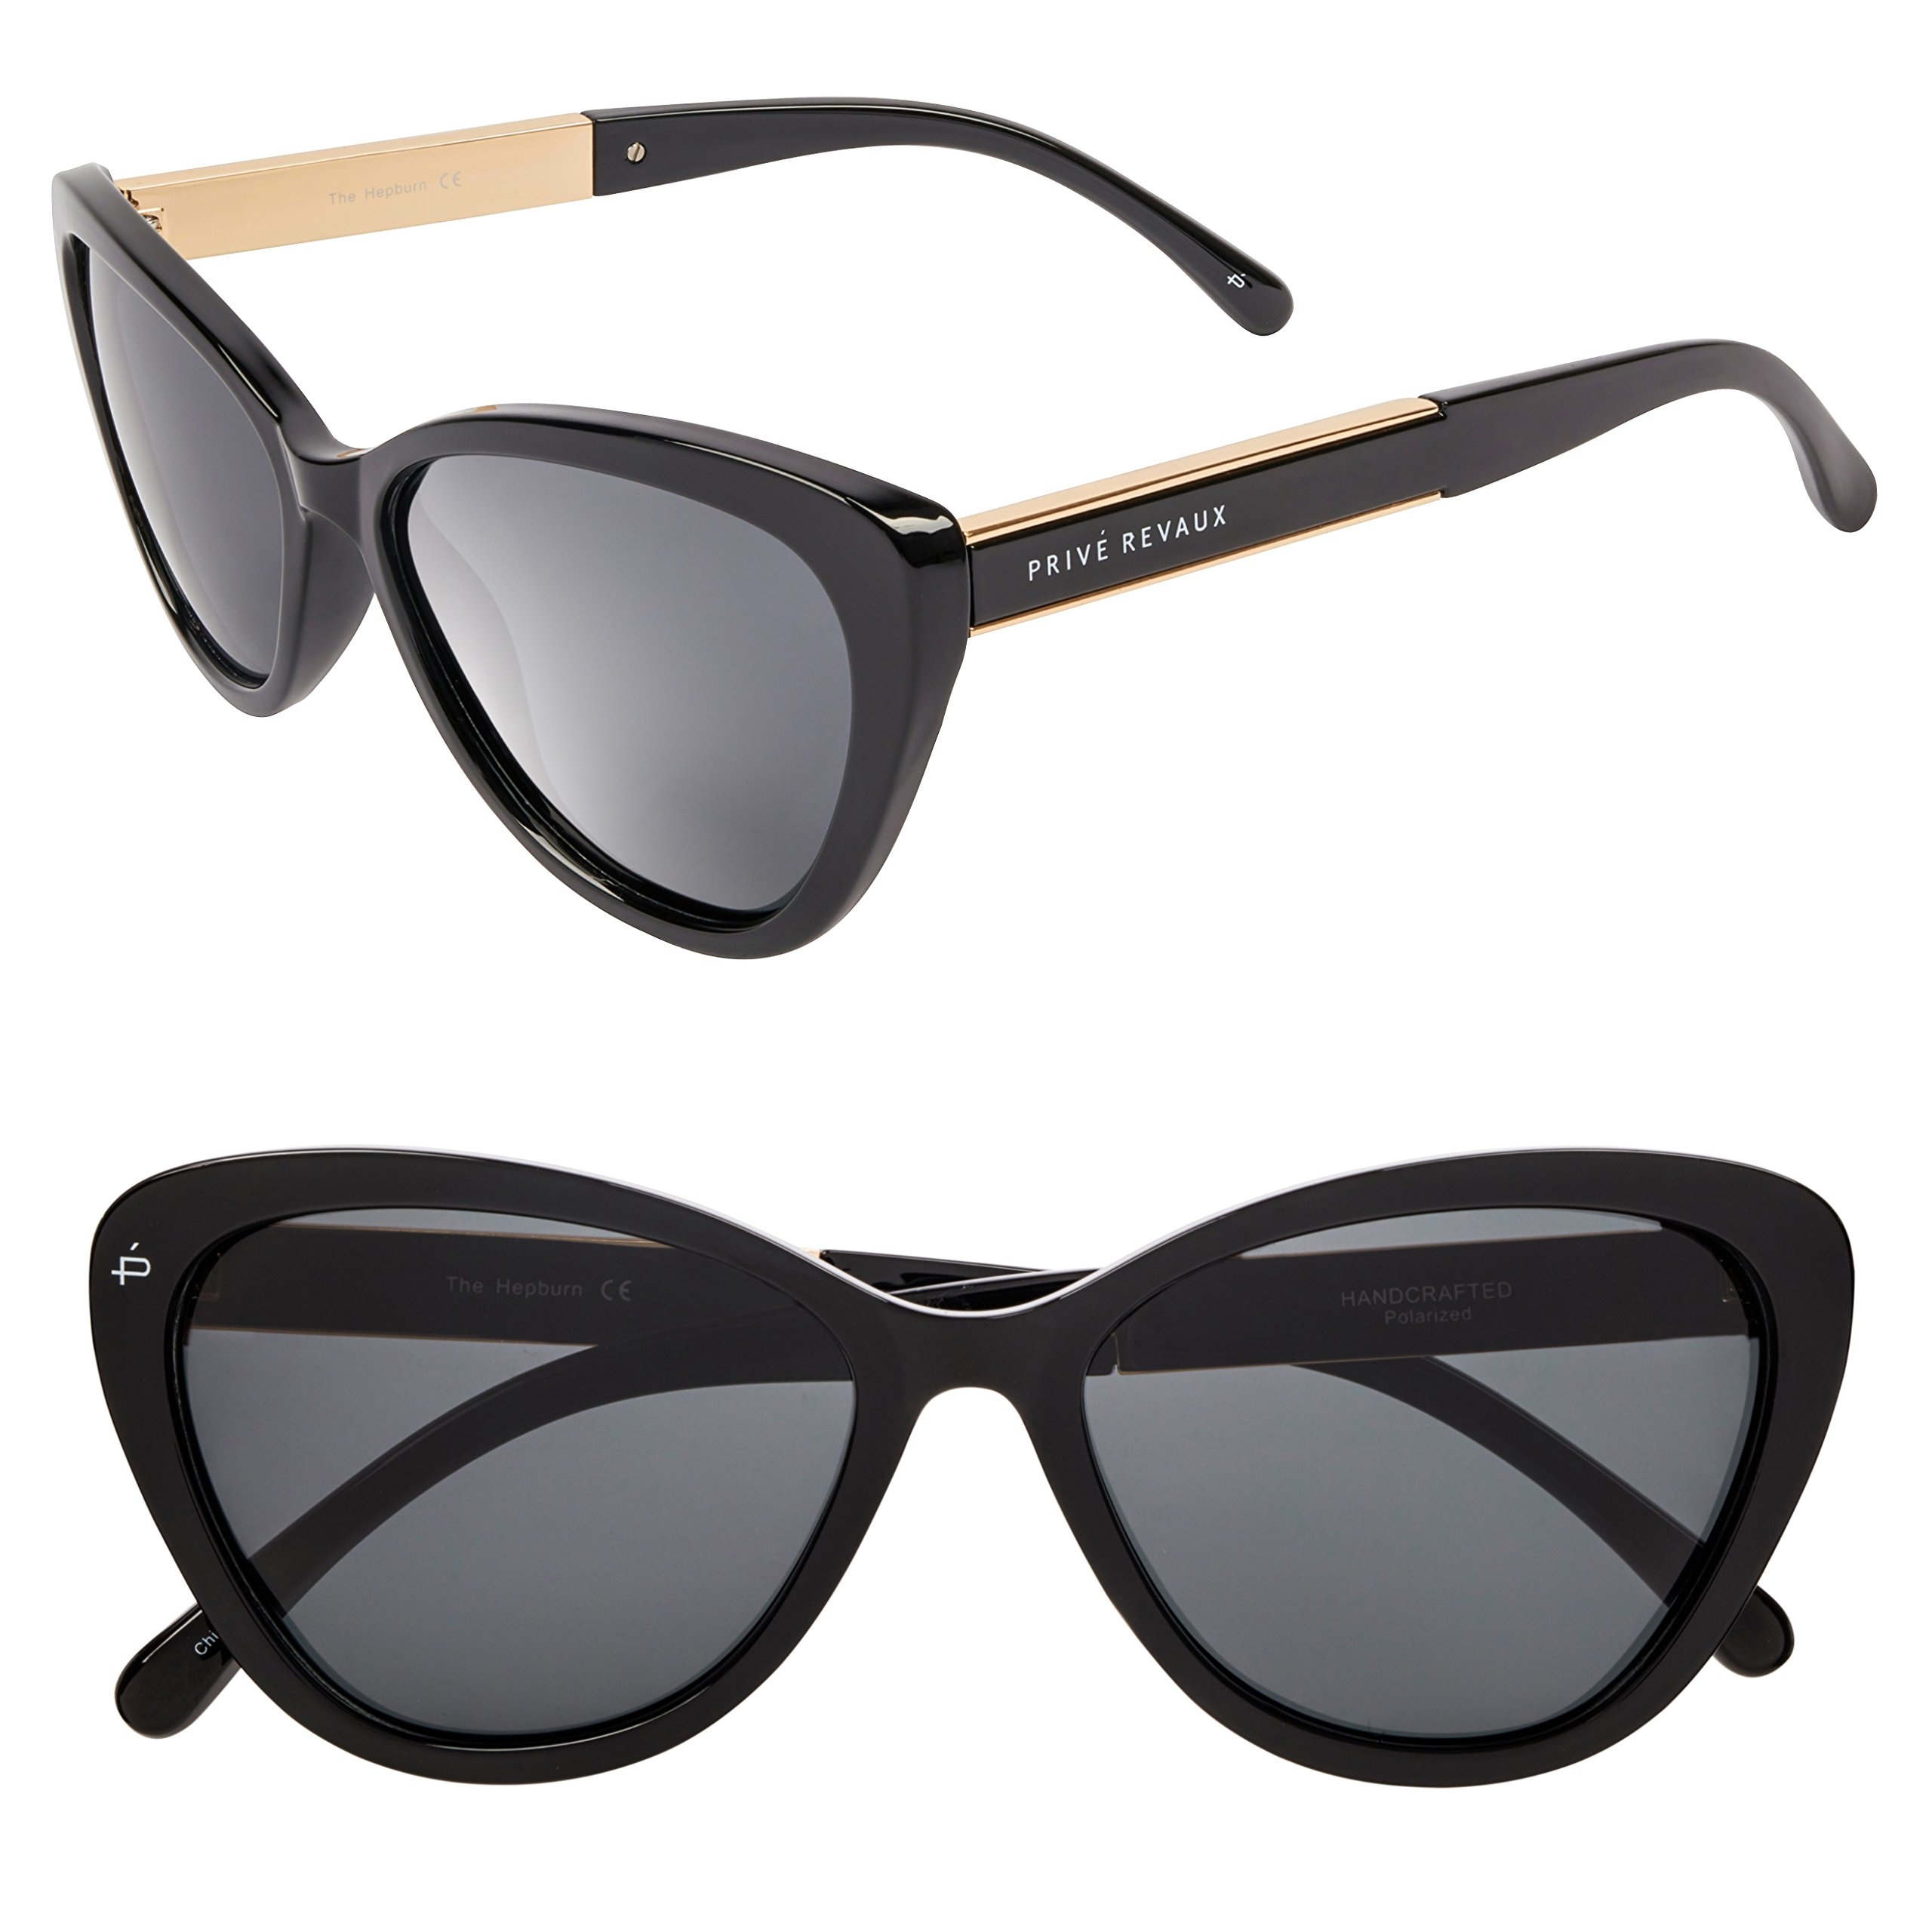 "PRIVÉ REVAUX ICON Collection ""The Hepburn"" Designer Polarized Retro Cat-Eye Sunglasses"